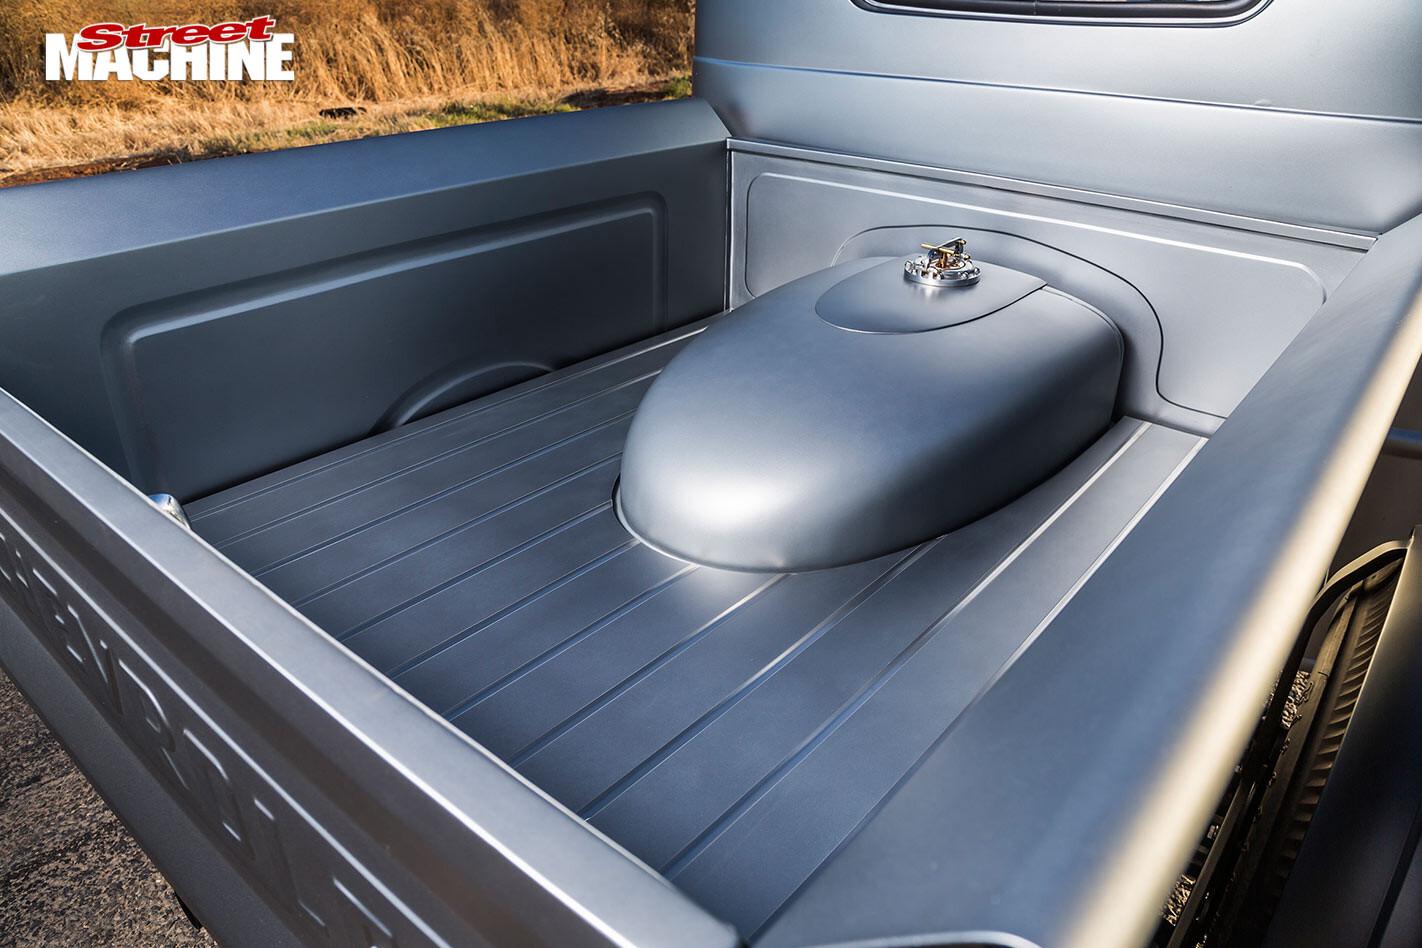 Chev pick-up tray